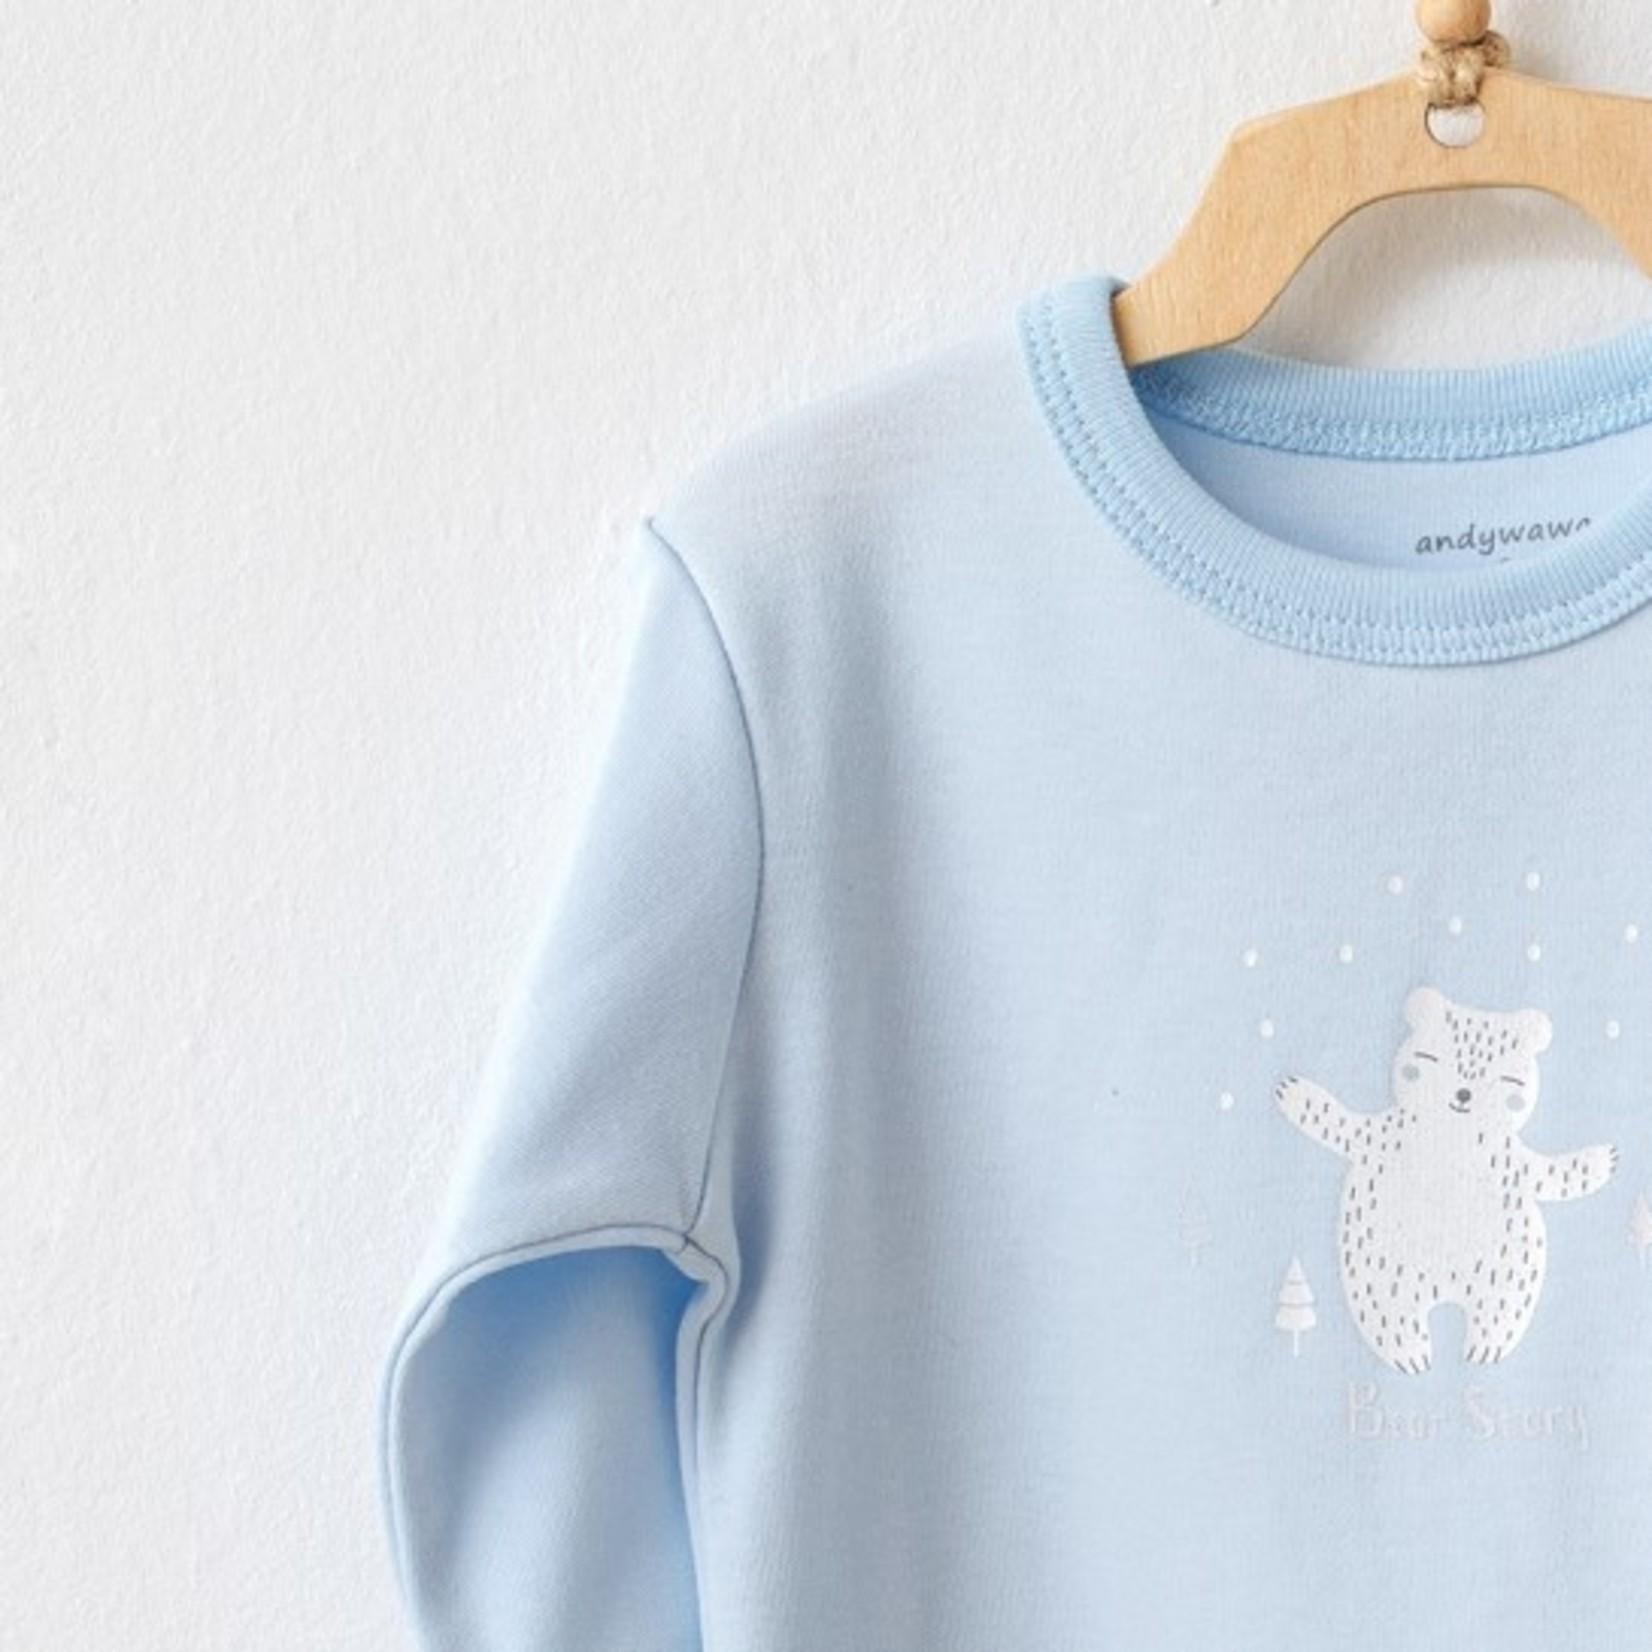 Tweedelige Set van Babykleding Jongens Longsleeve Trui en Broekje